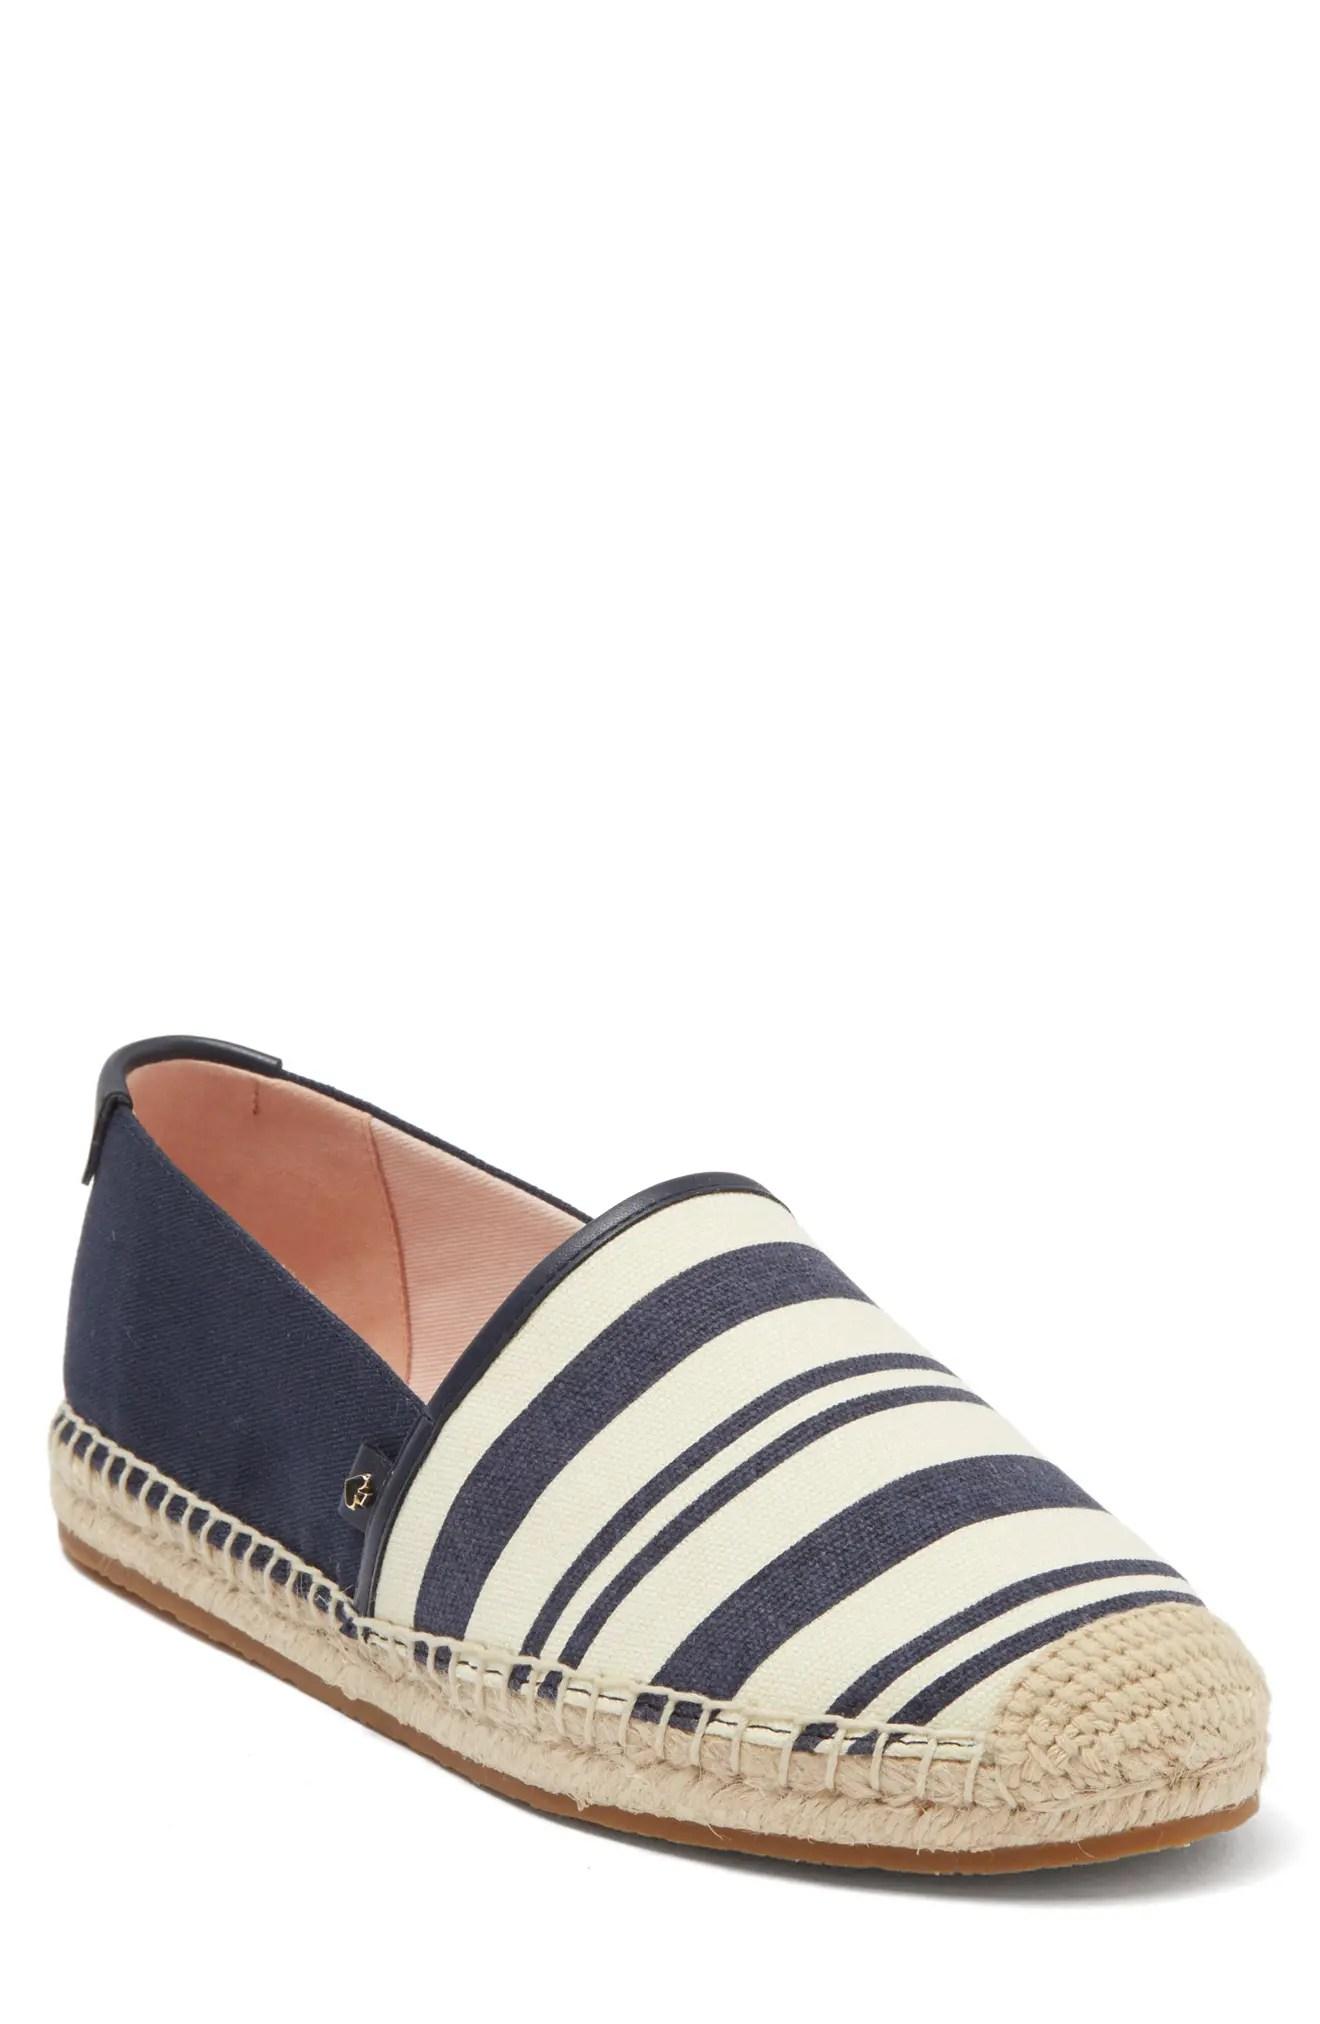 https www nordstromrack com brands kate 20spade 20new 20york women shoes espadrilles